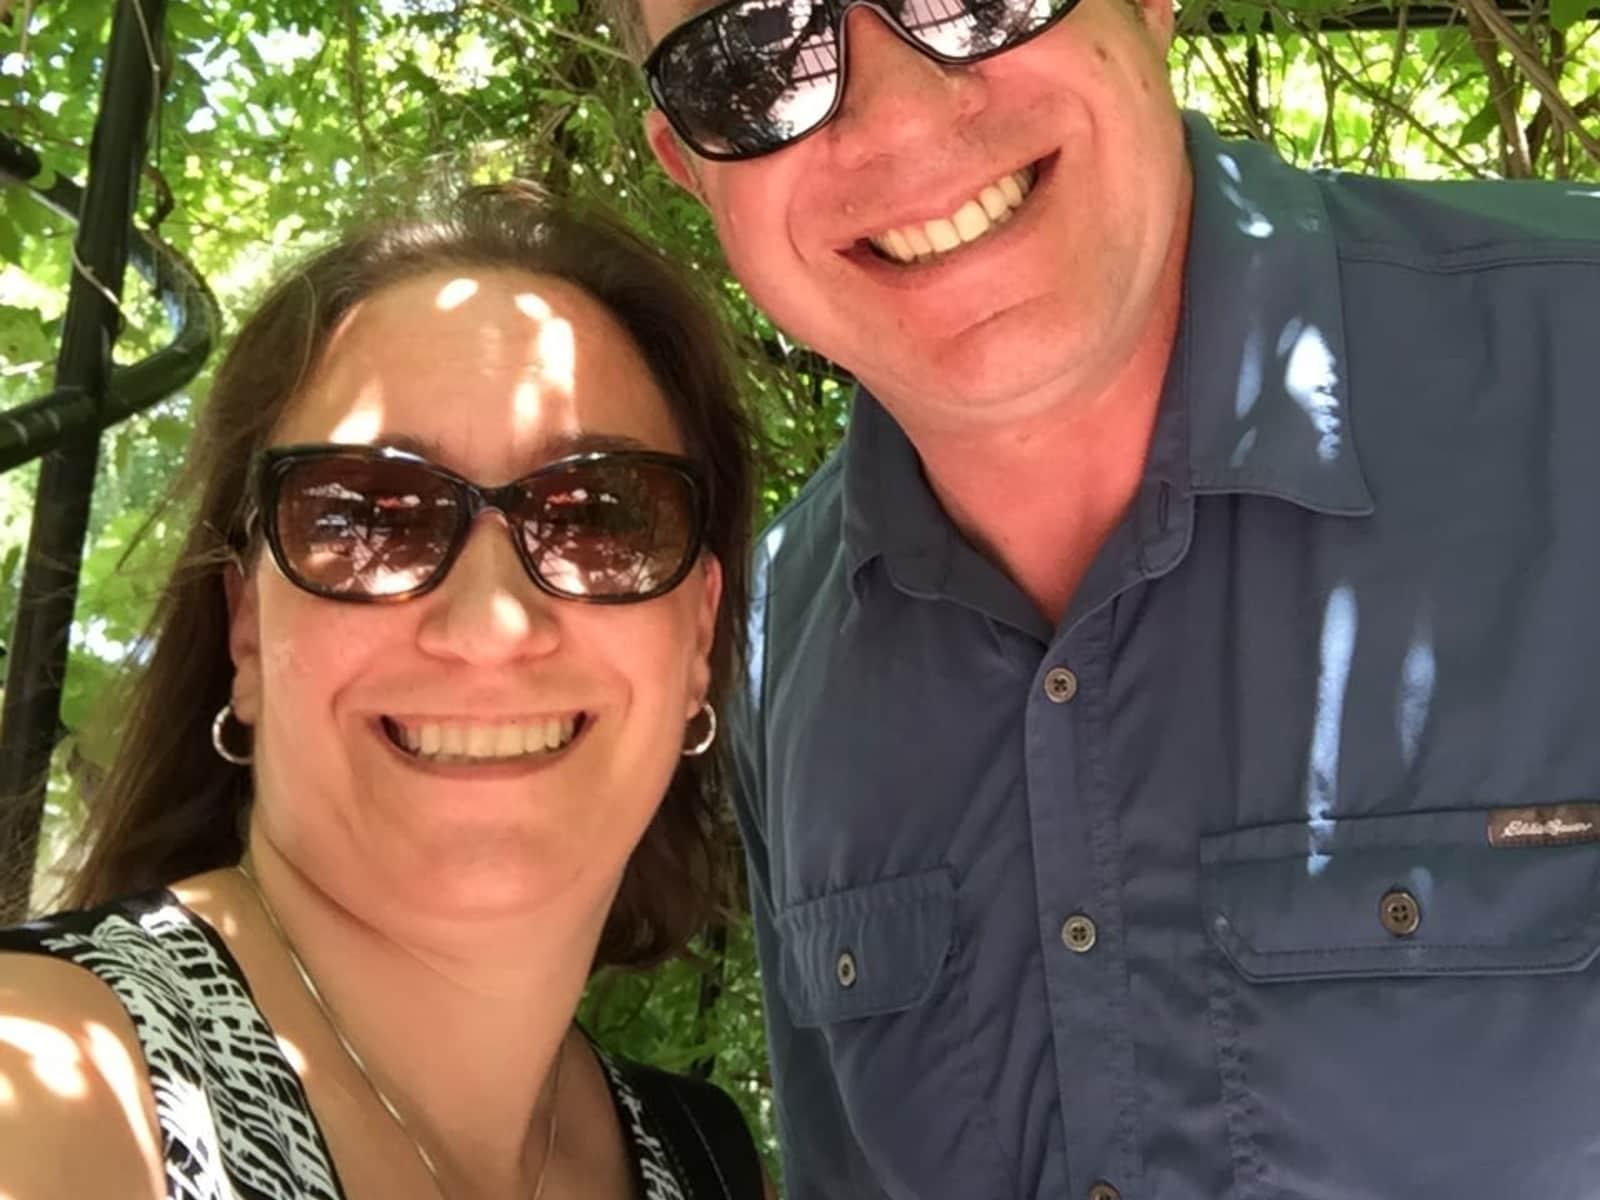 Fara & Robert from Dublin, Ireland